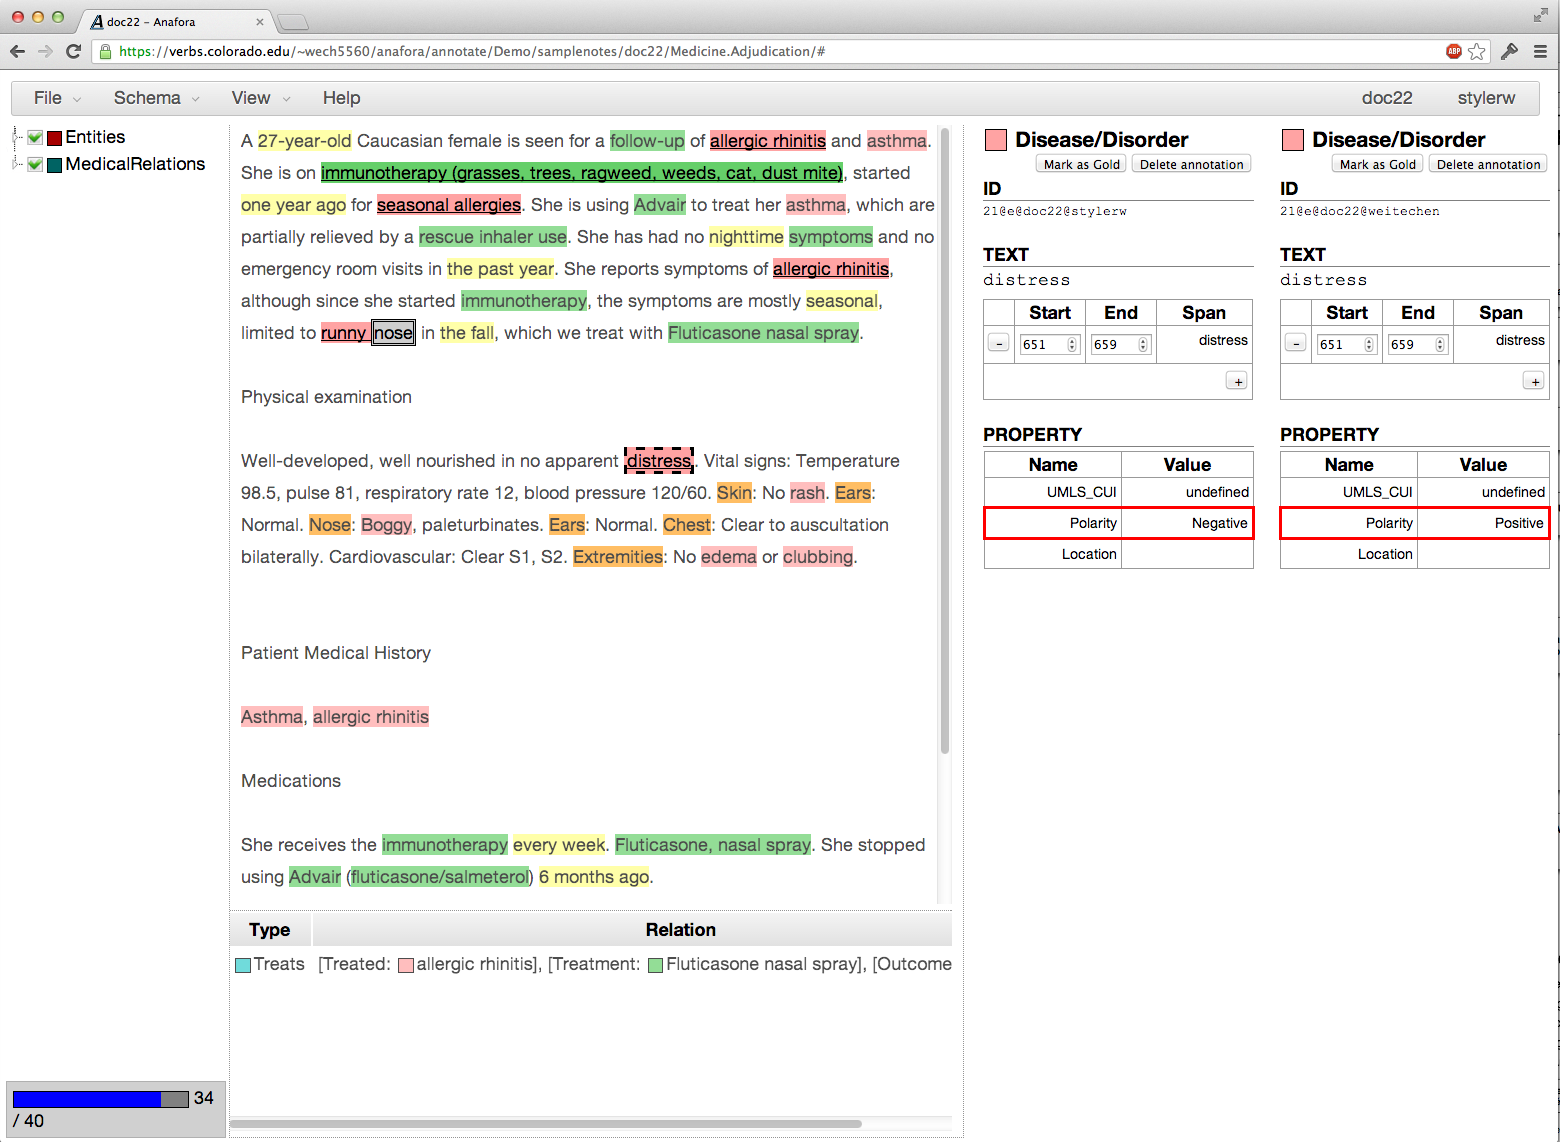 GitHub - weitechen/anafora: Anafora is a web-based raw text